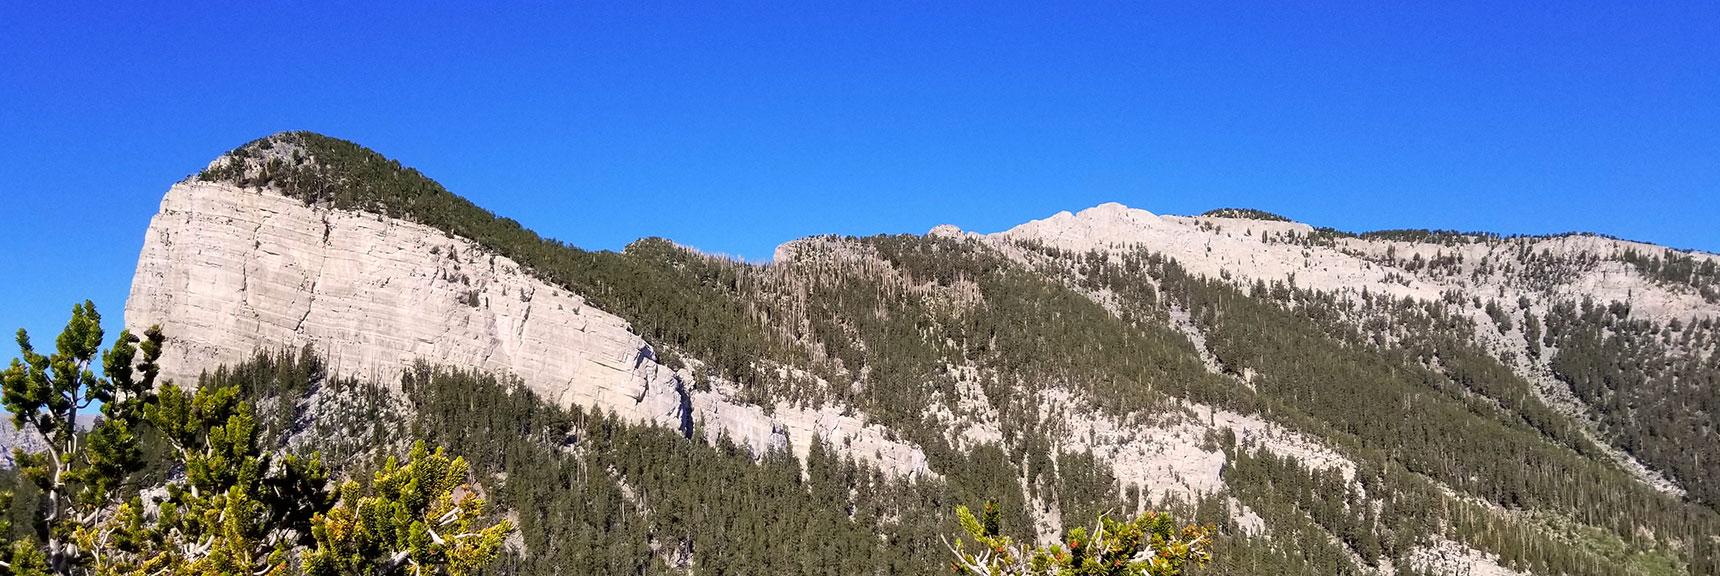 Mummy Mountain Toes | Mt Charleston Wilderness | Spring Mountains, Nevada